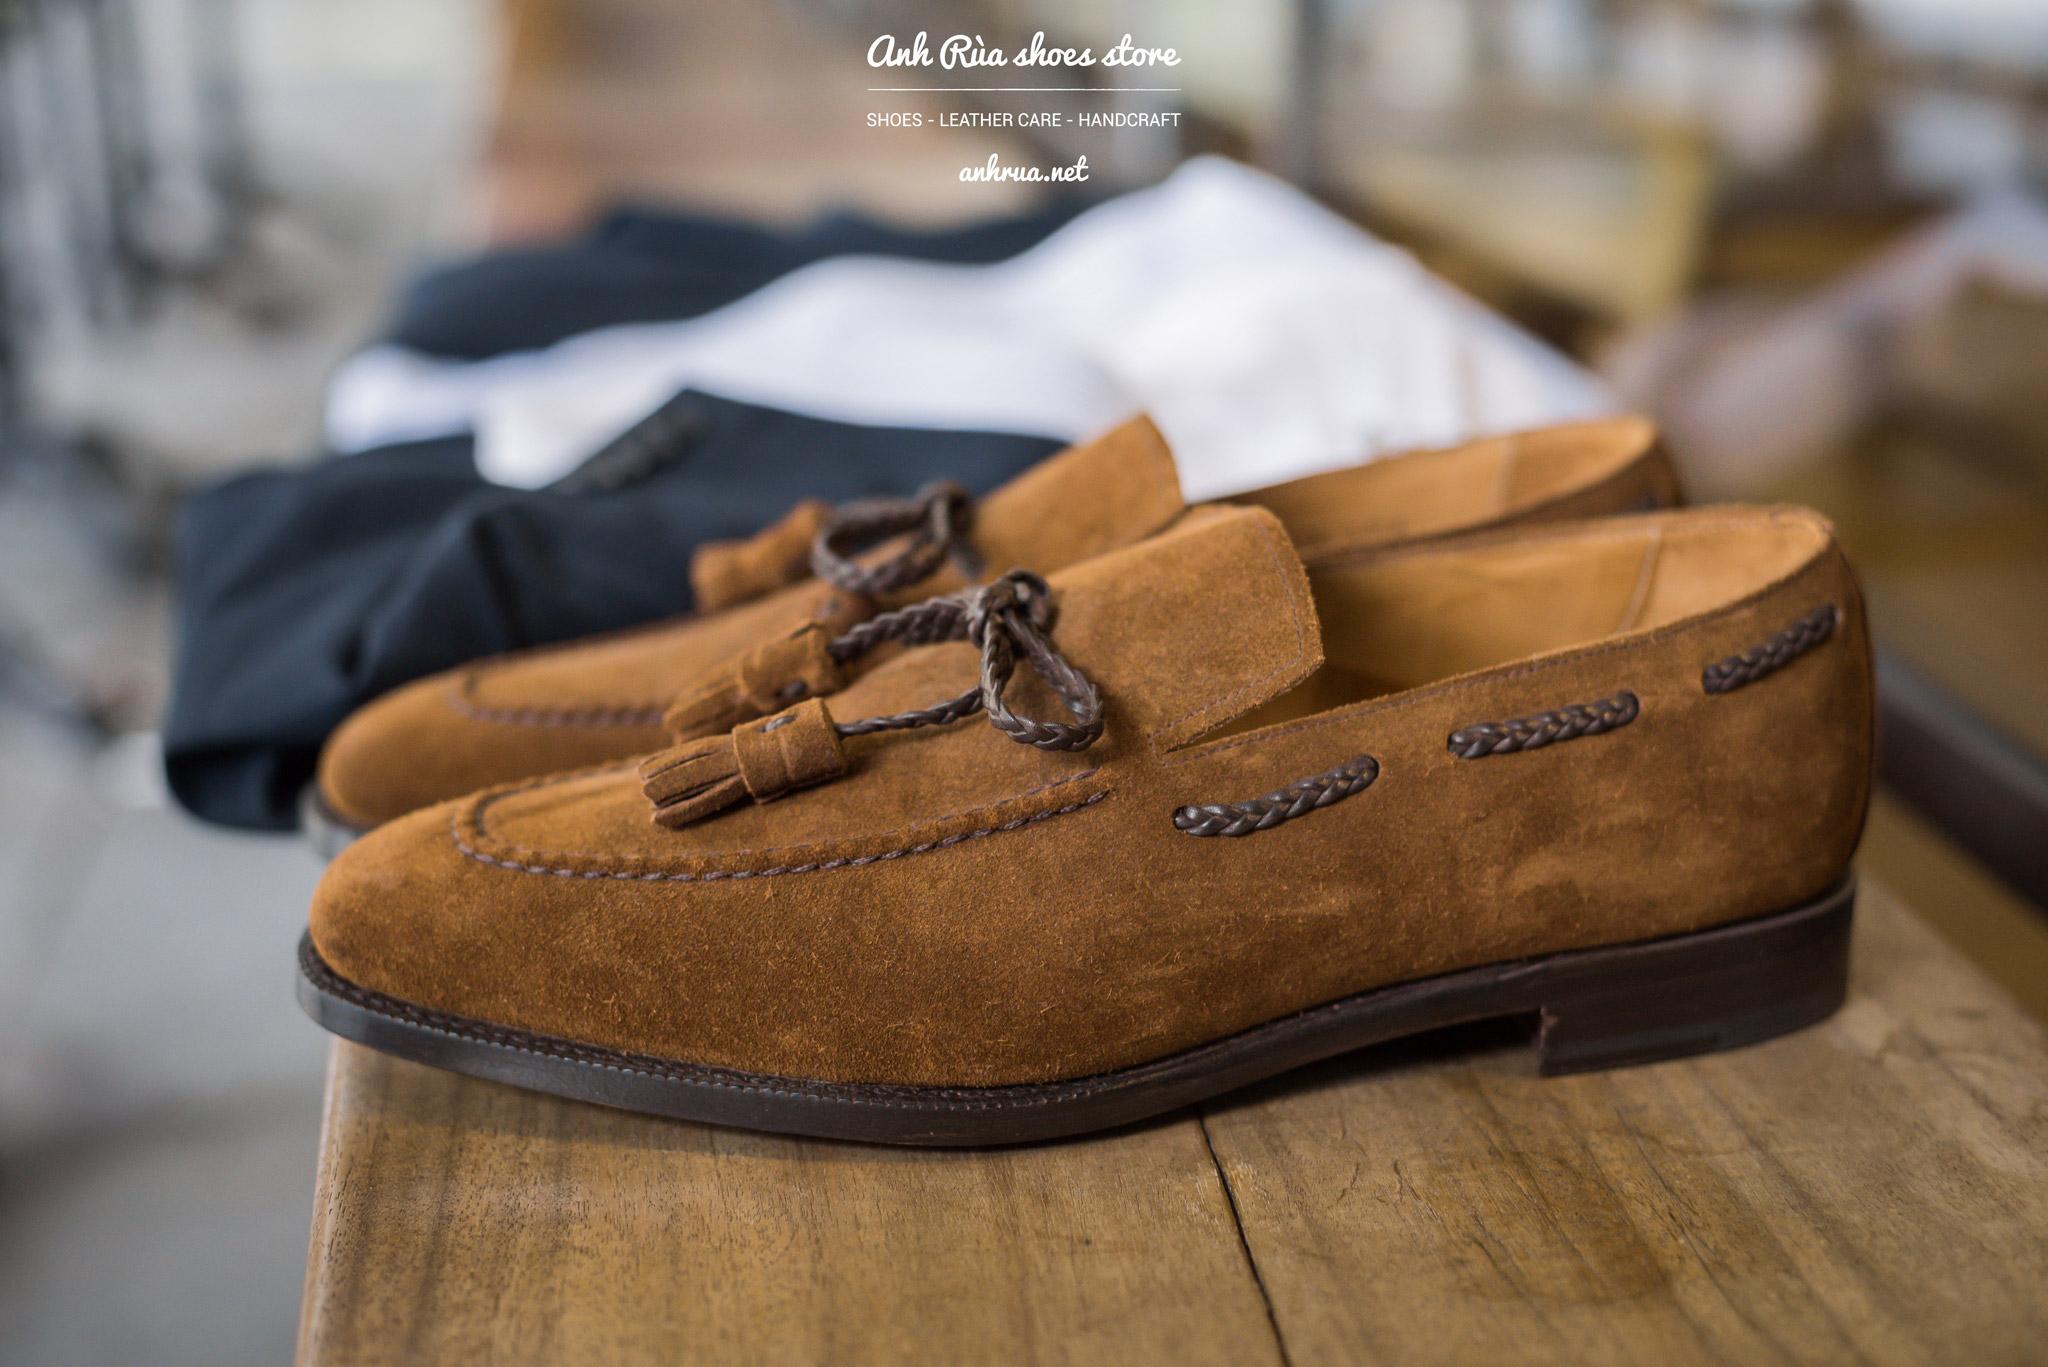 Giày Lười Nam Suede Medium Brown Tassel Loafers J.FitzPatrick